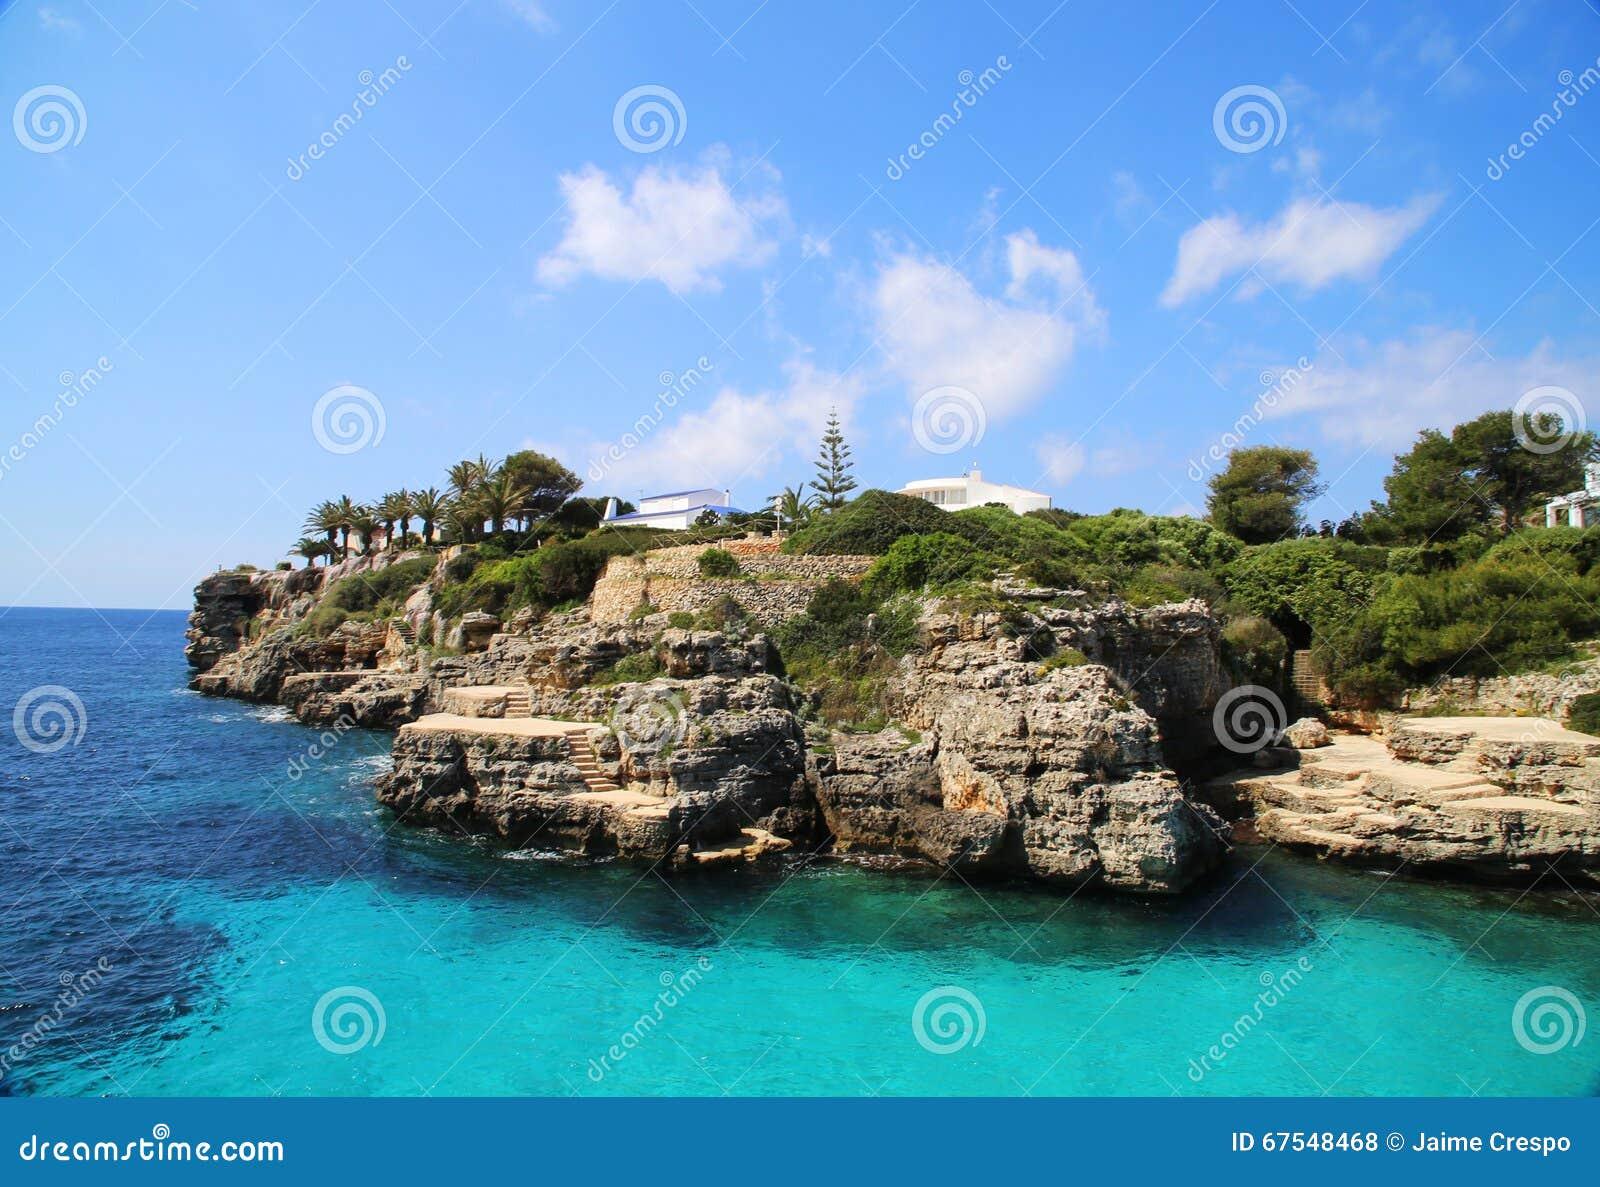 Nice Sea Place Stock Photo. Image Of Paradise, Nature